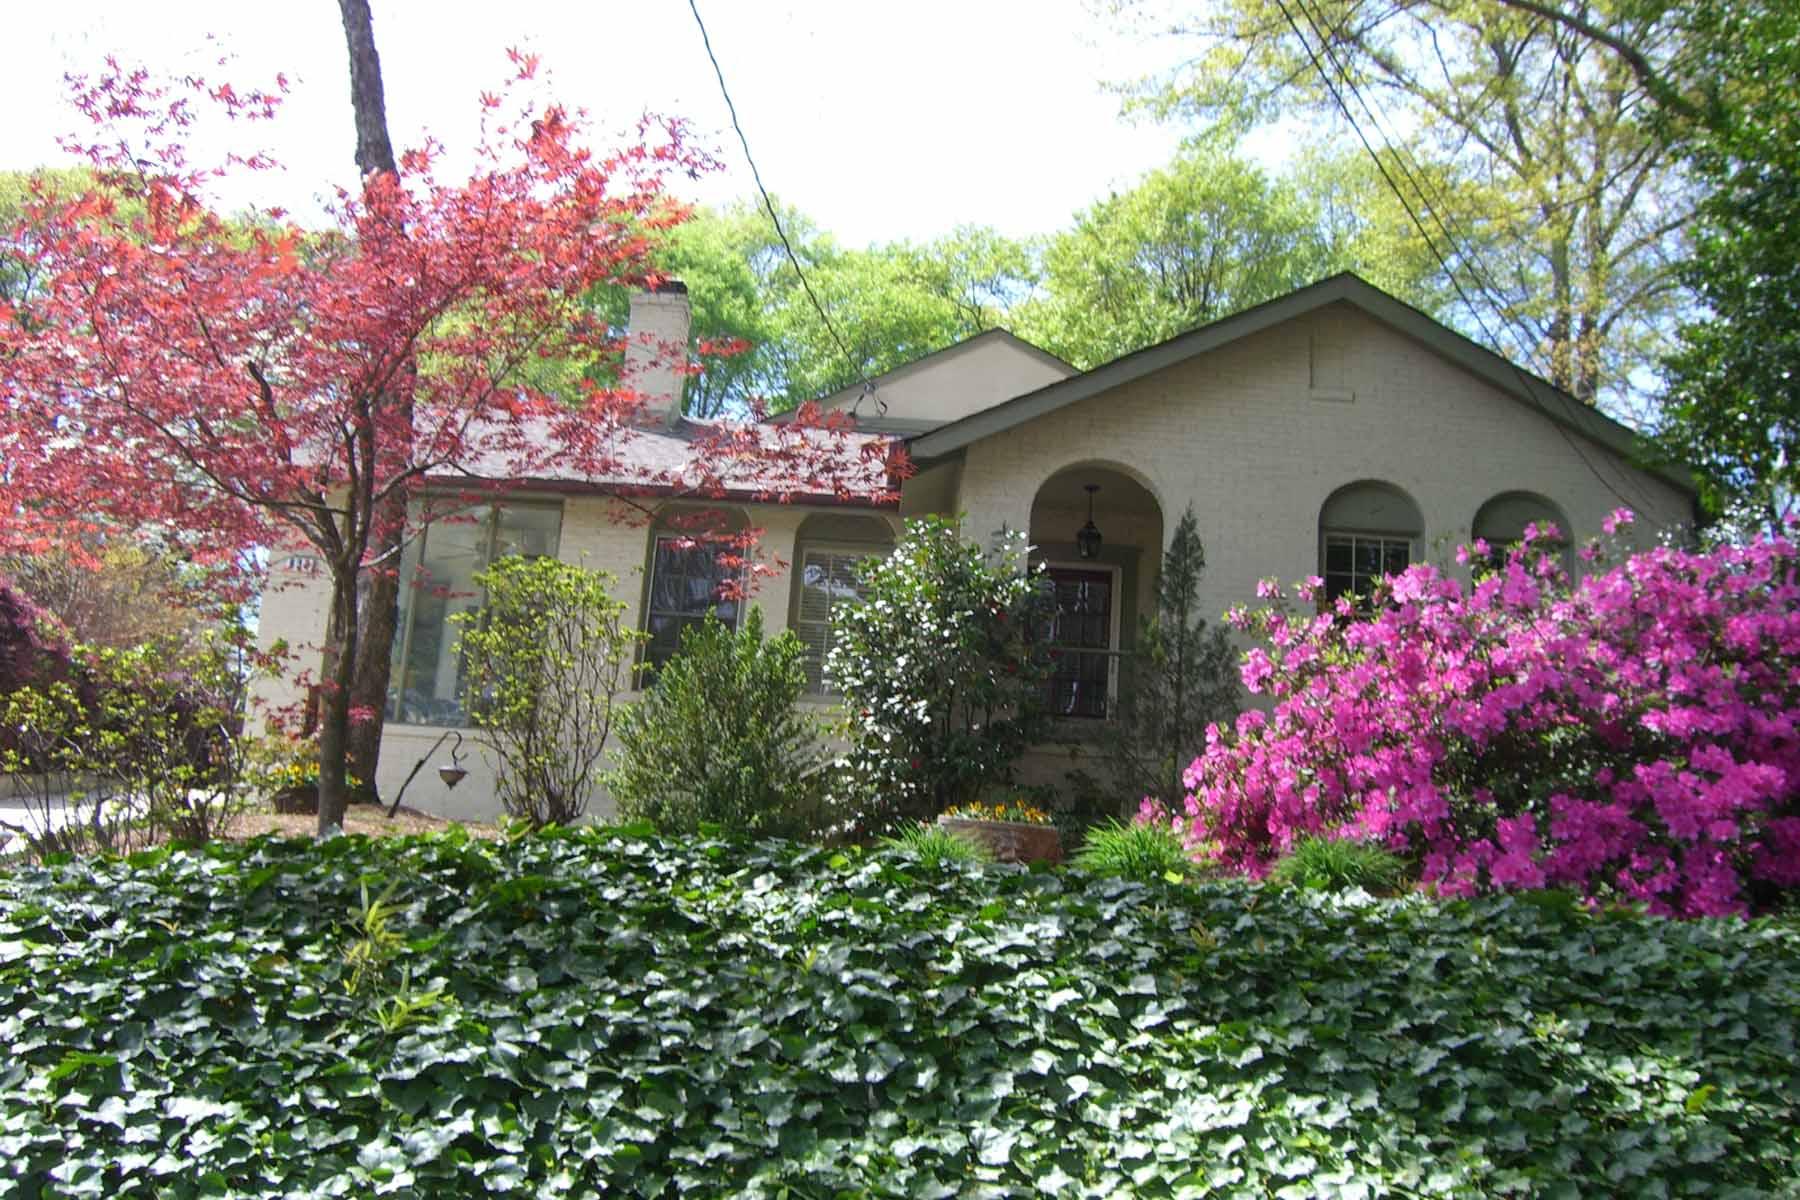 Villa per Vendita alle ore Charming Hilltop Cottage with Pool 830 Mentelle Drive Midtown, Atlanta, Georgia, 30308 Stati Uniti